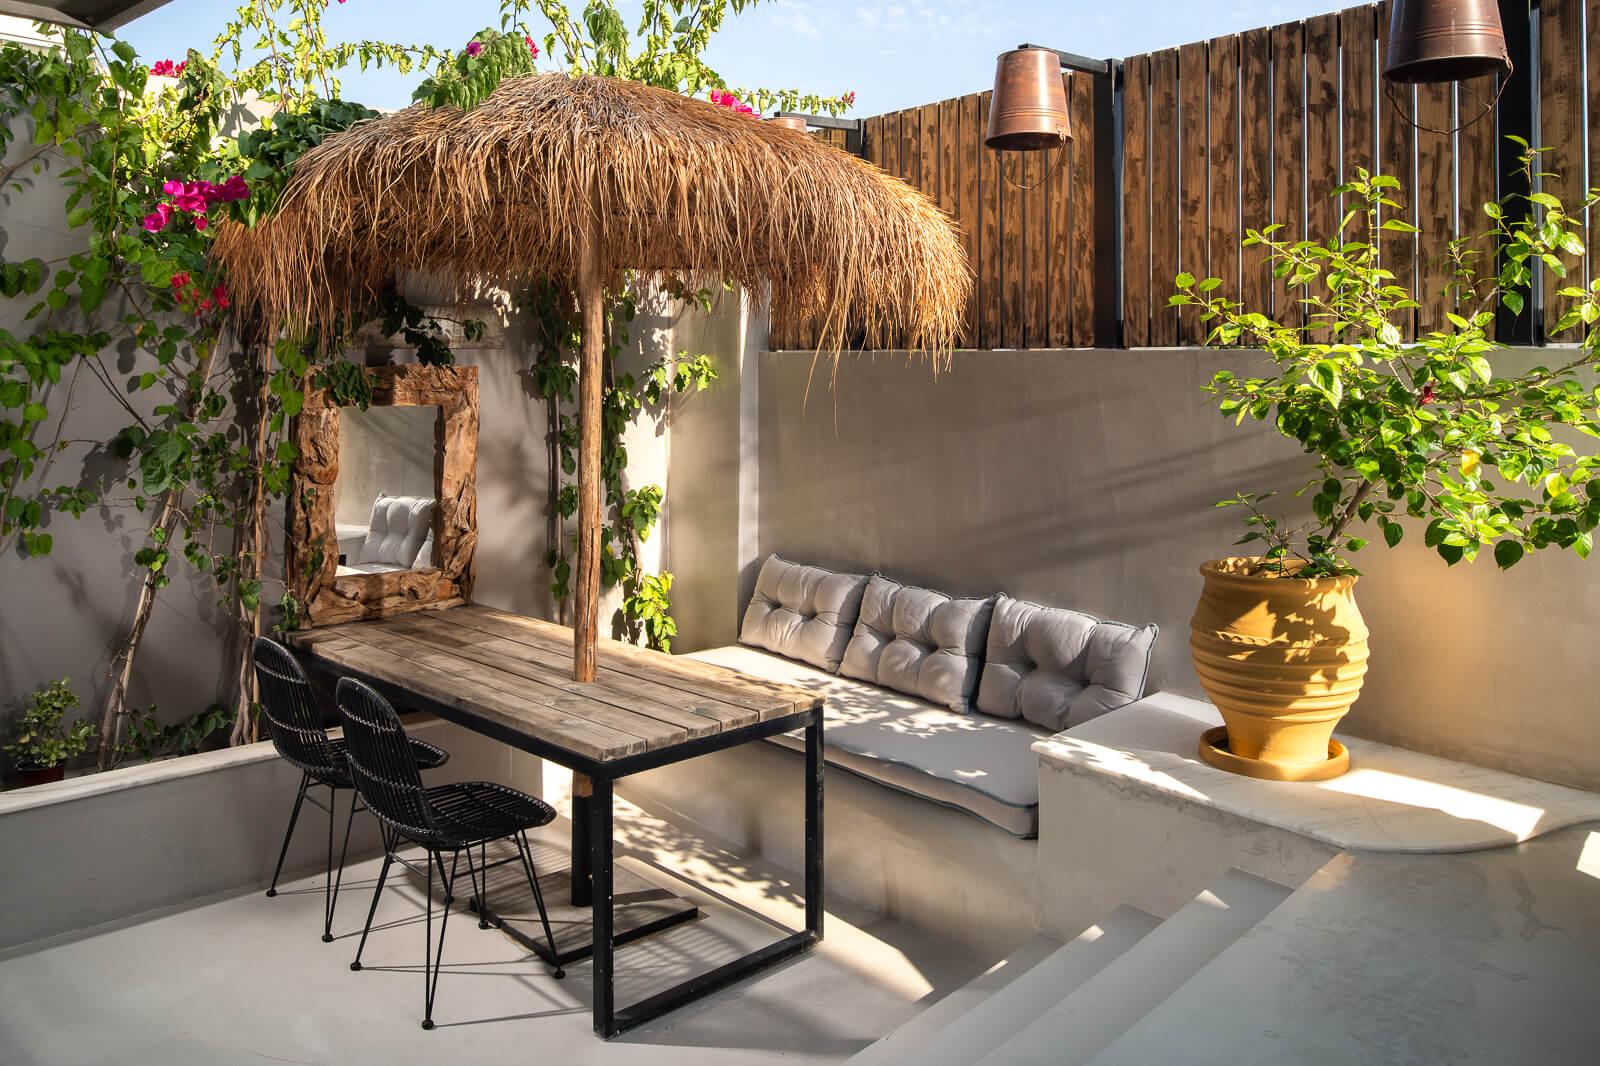 Iviskos Suite Private Terrace - Elakati Hotel in Rhodes Greece